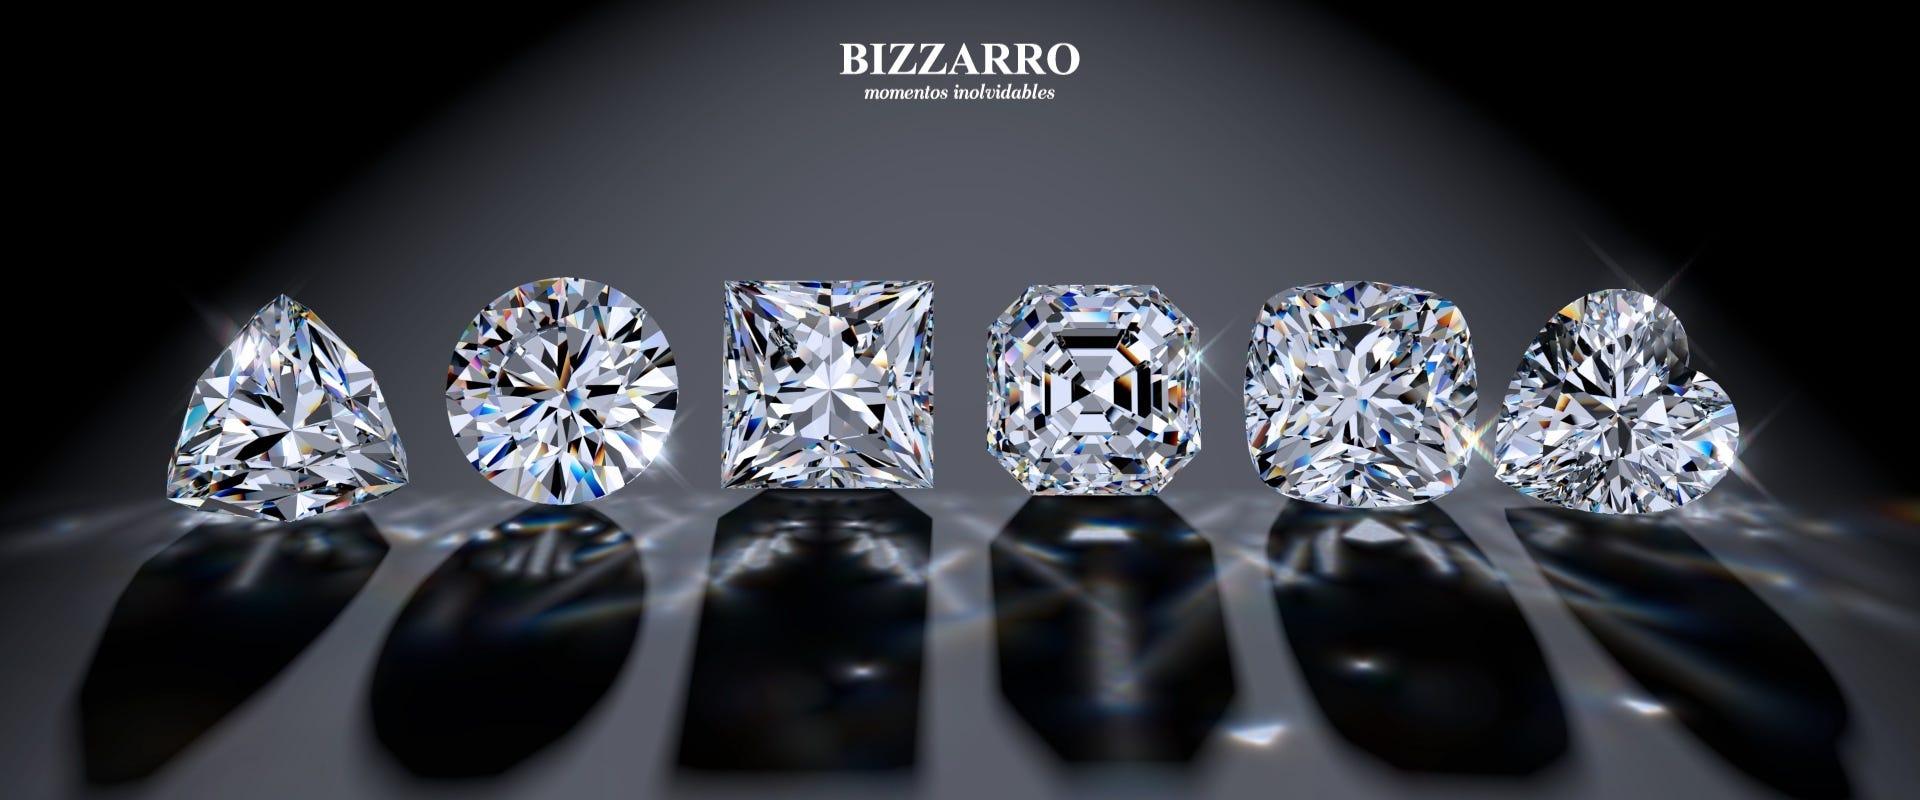 Cosas que debes saber antes de comprar un diamante